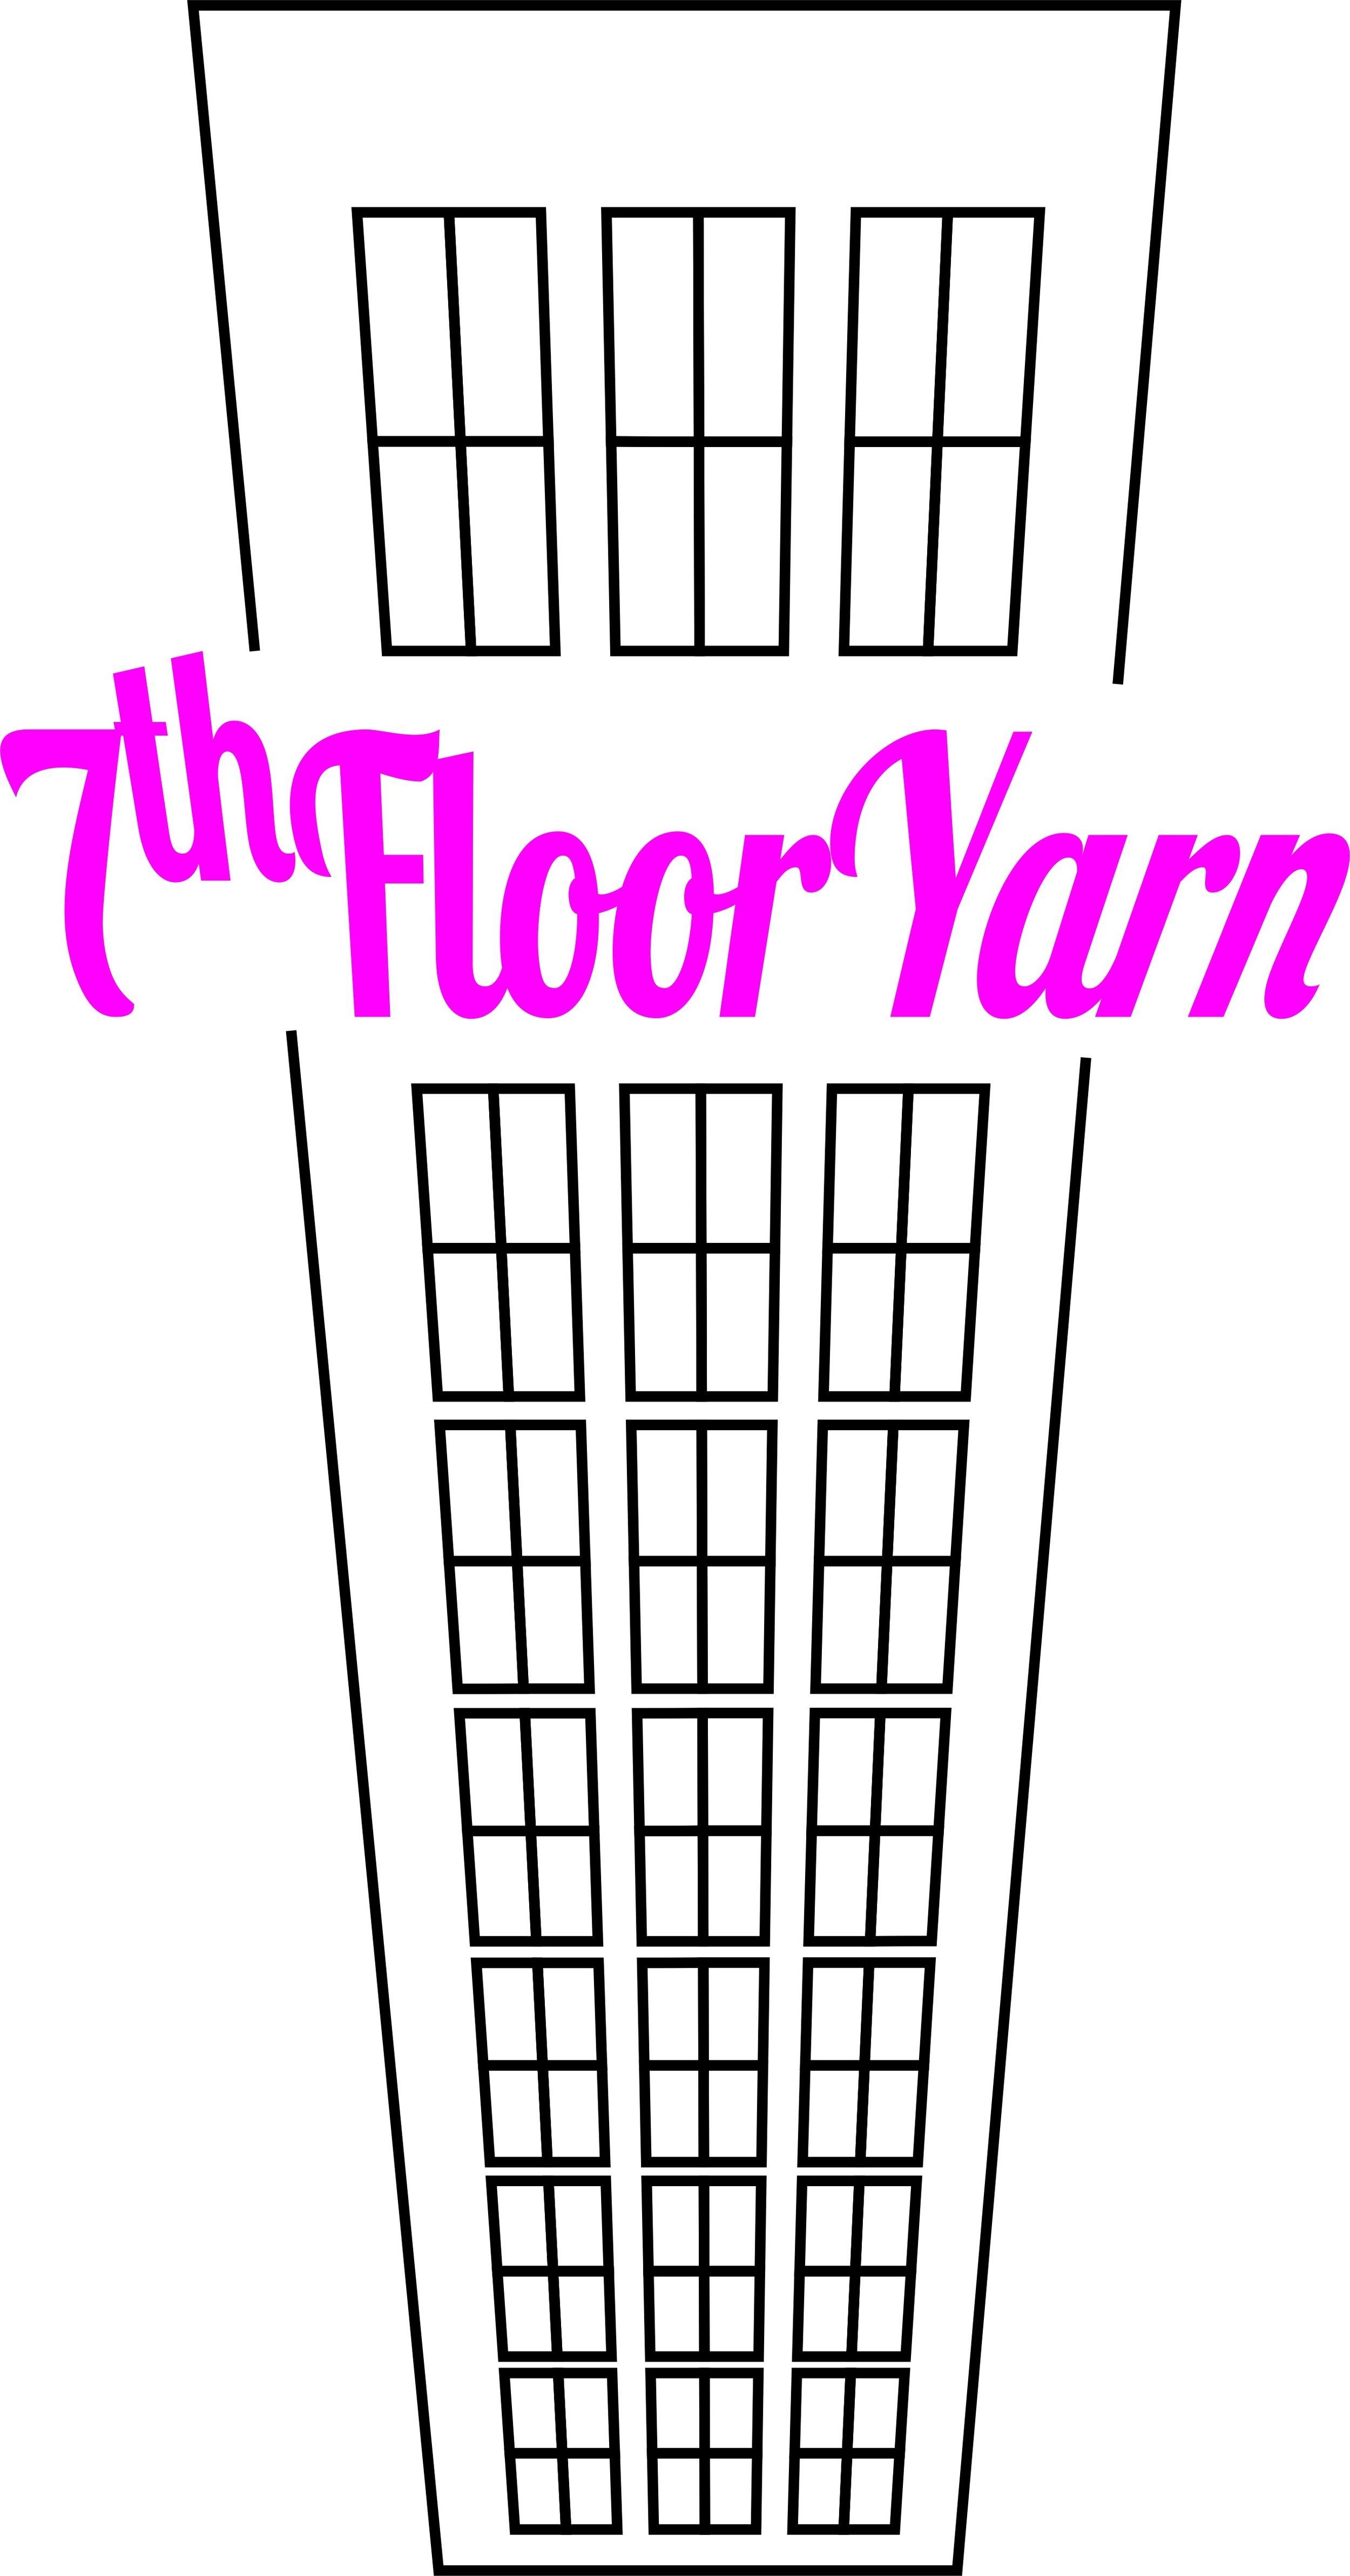 7thFloorYarn-logo.jpg